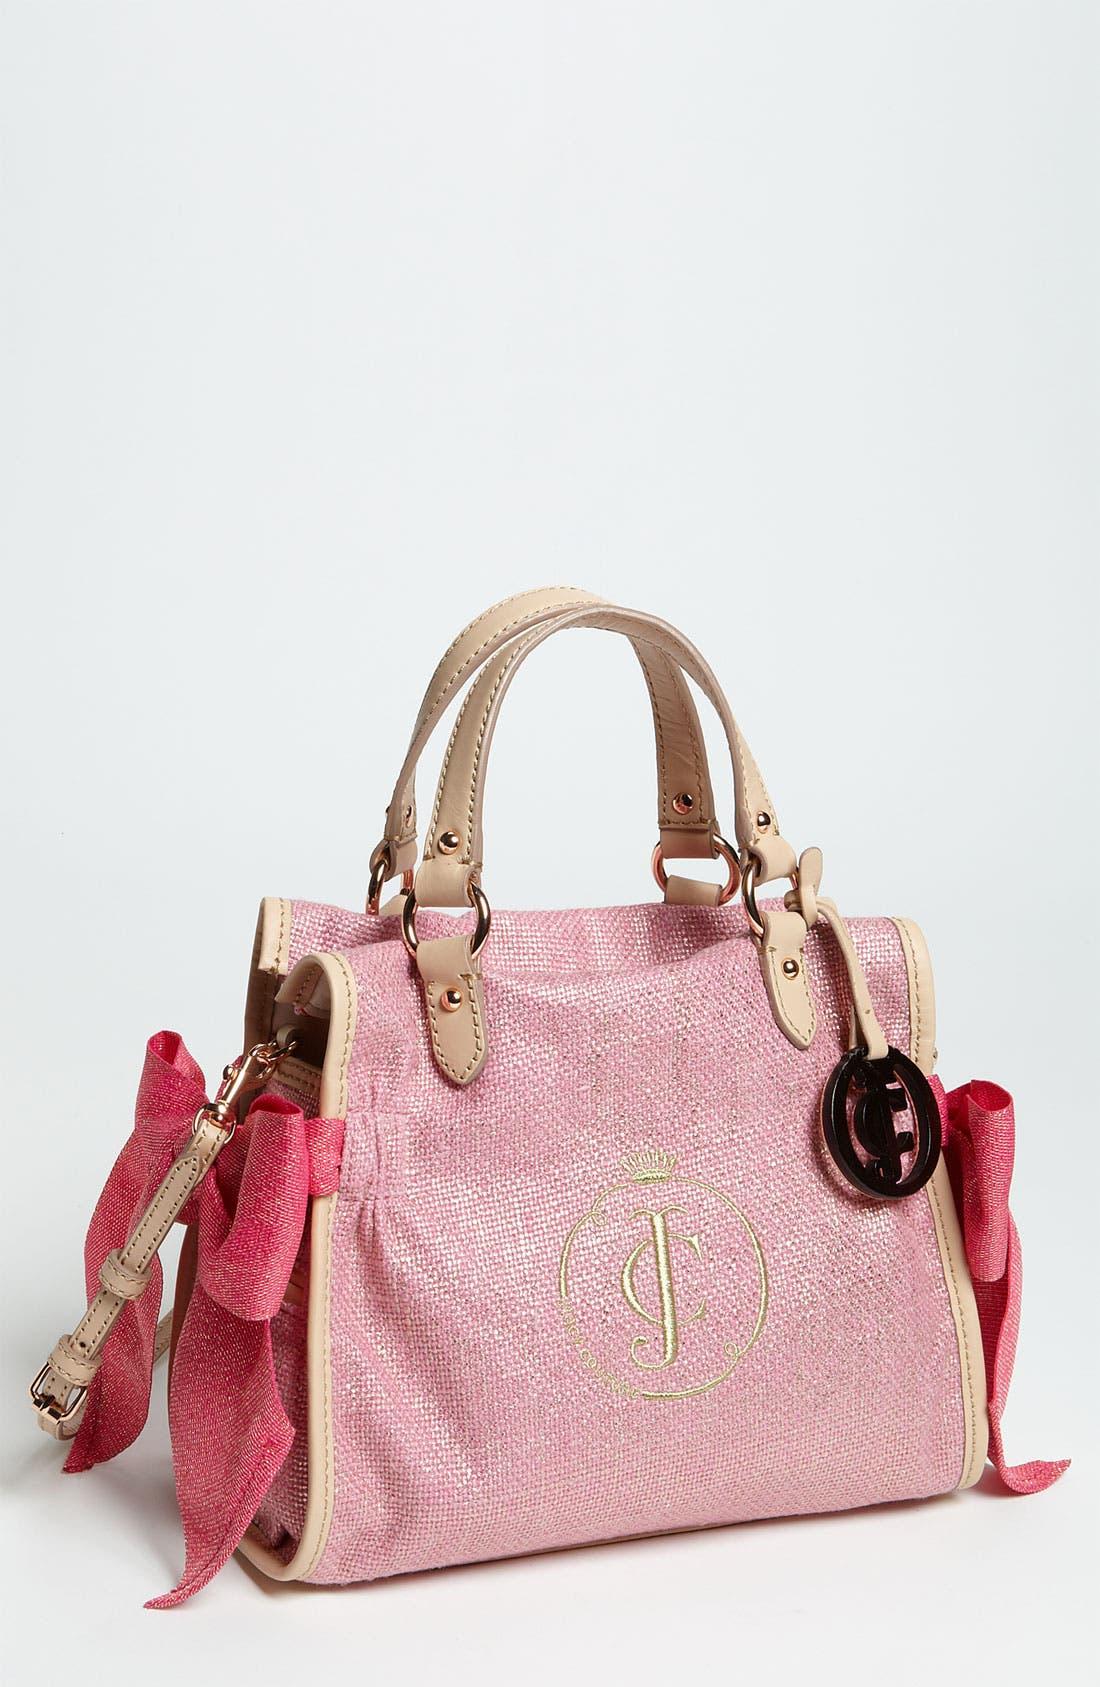 Alternate Image 1 Selected - Juicy Couture 'Miss Daydreamer' Handbag